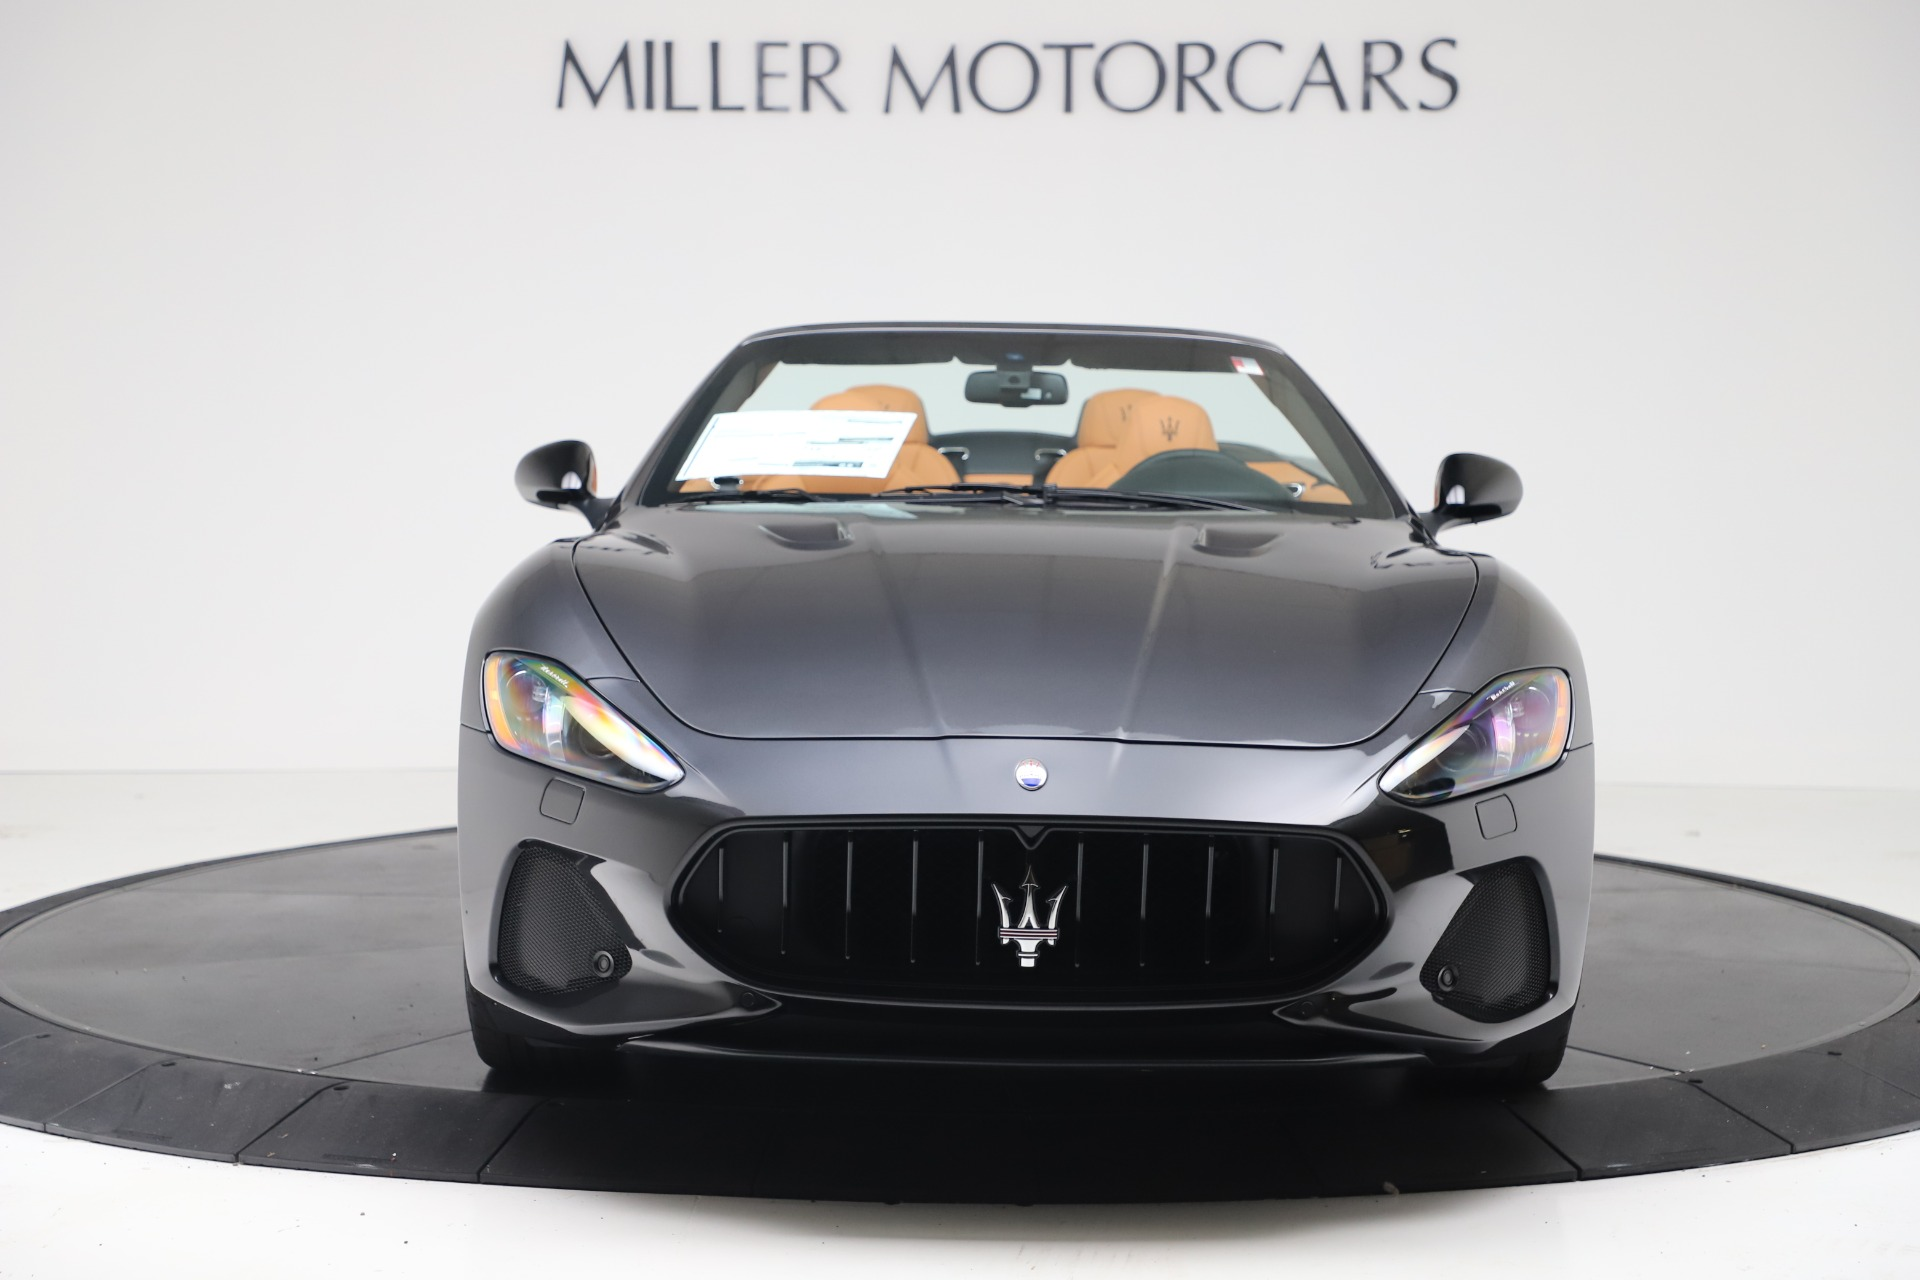 New 2019 Maserati GranTurismo MC Convertible For Sale In Westport, CT 3468_p12